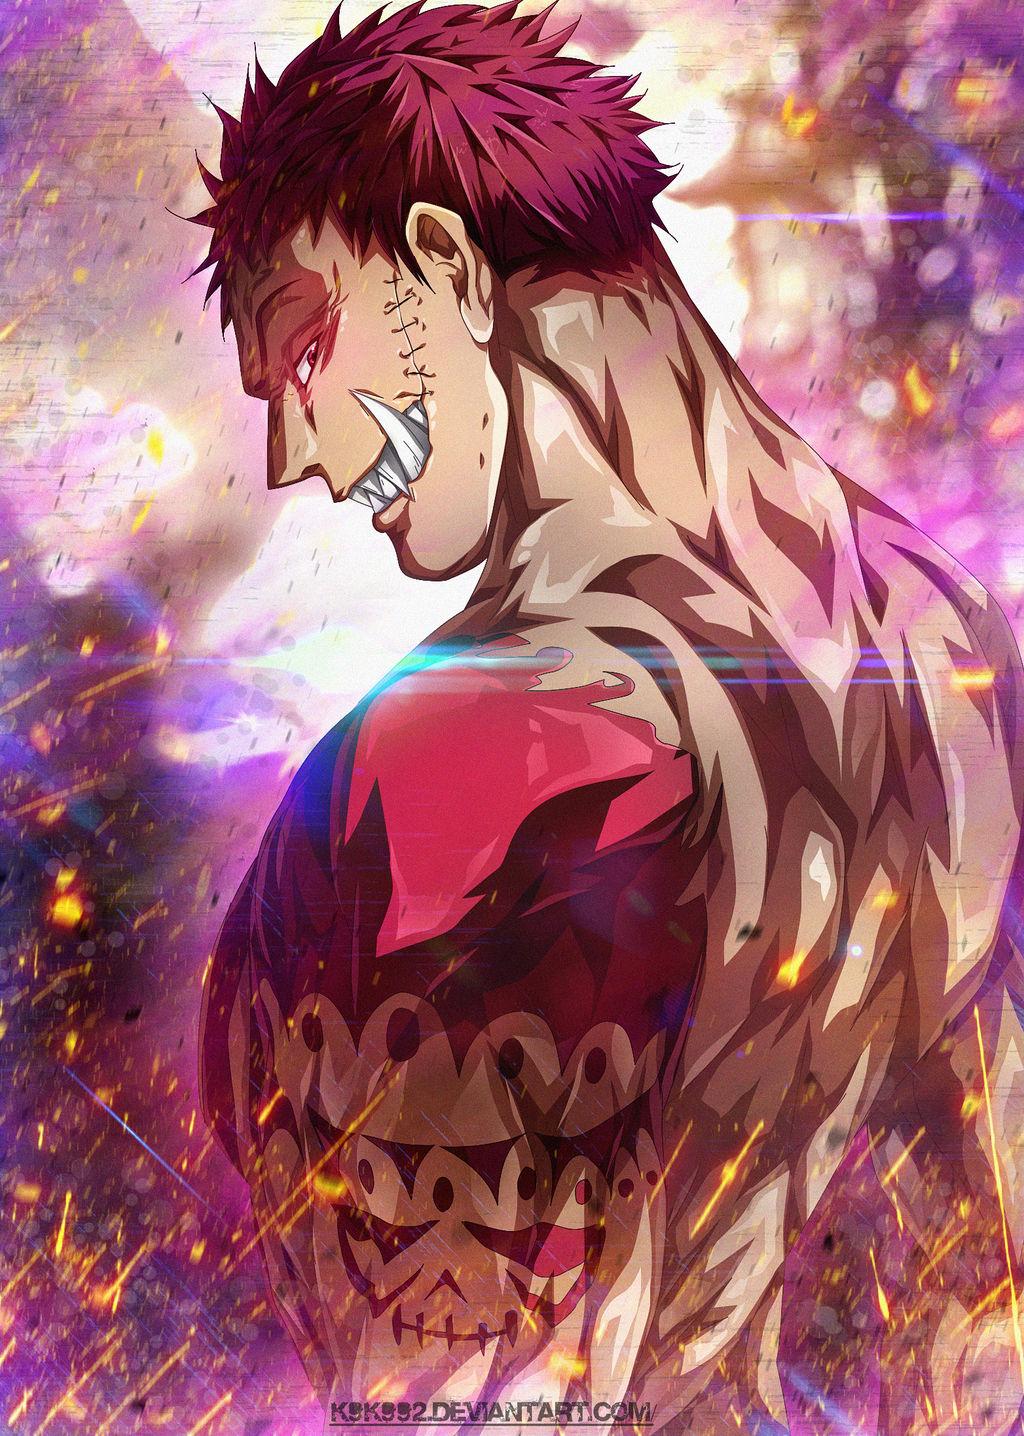 Katakuri - One Piece by k9k992 on DeviantArt